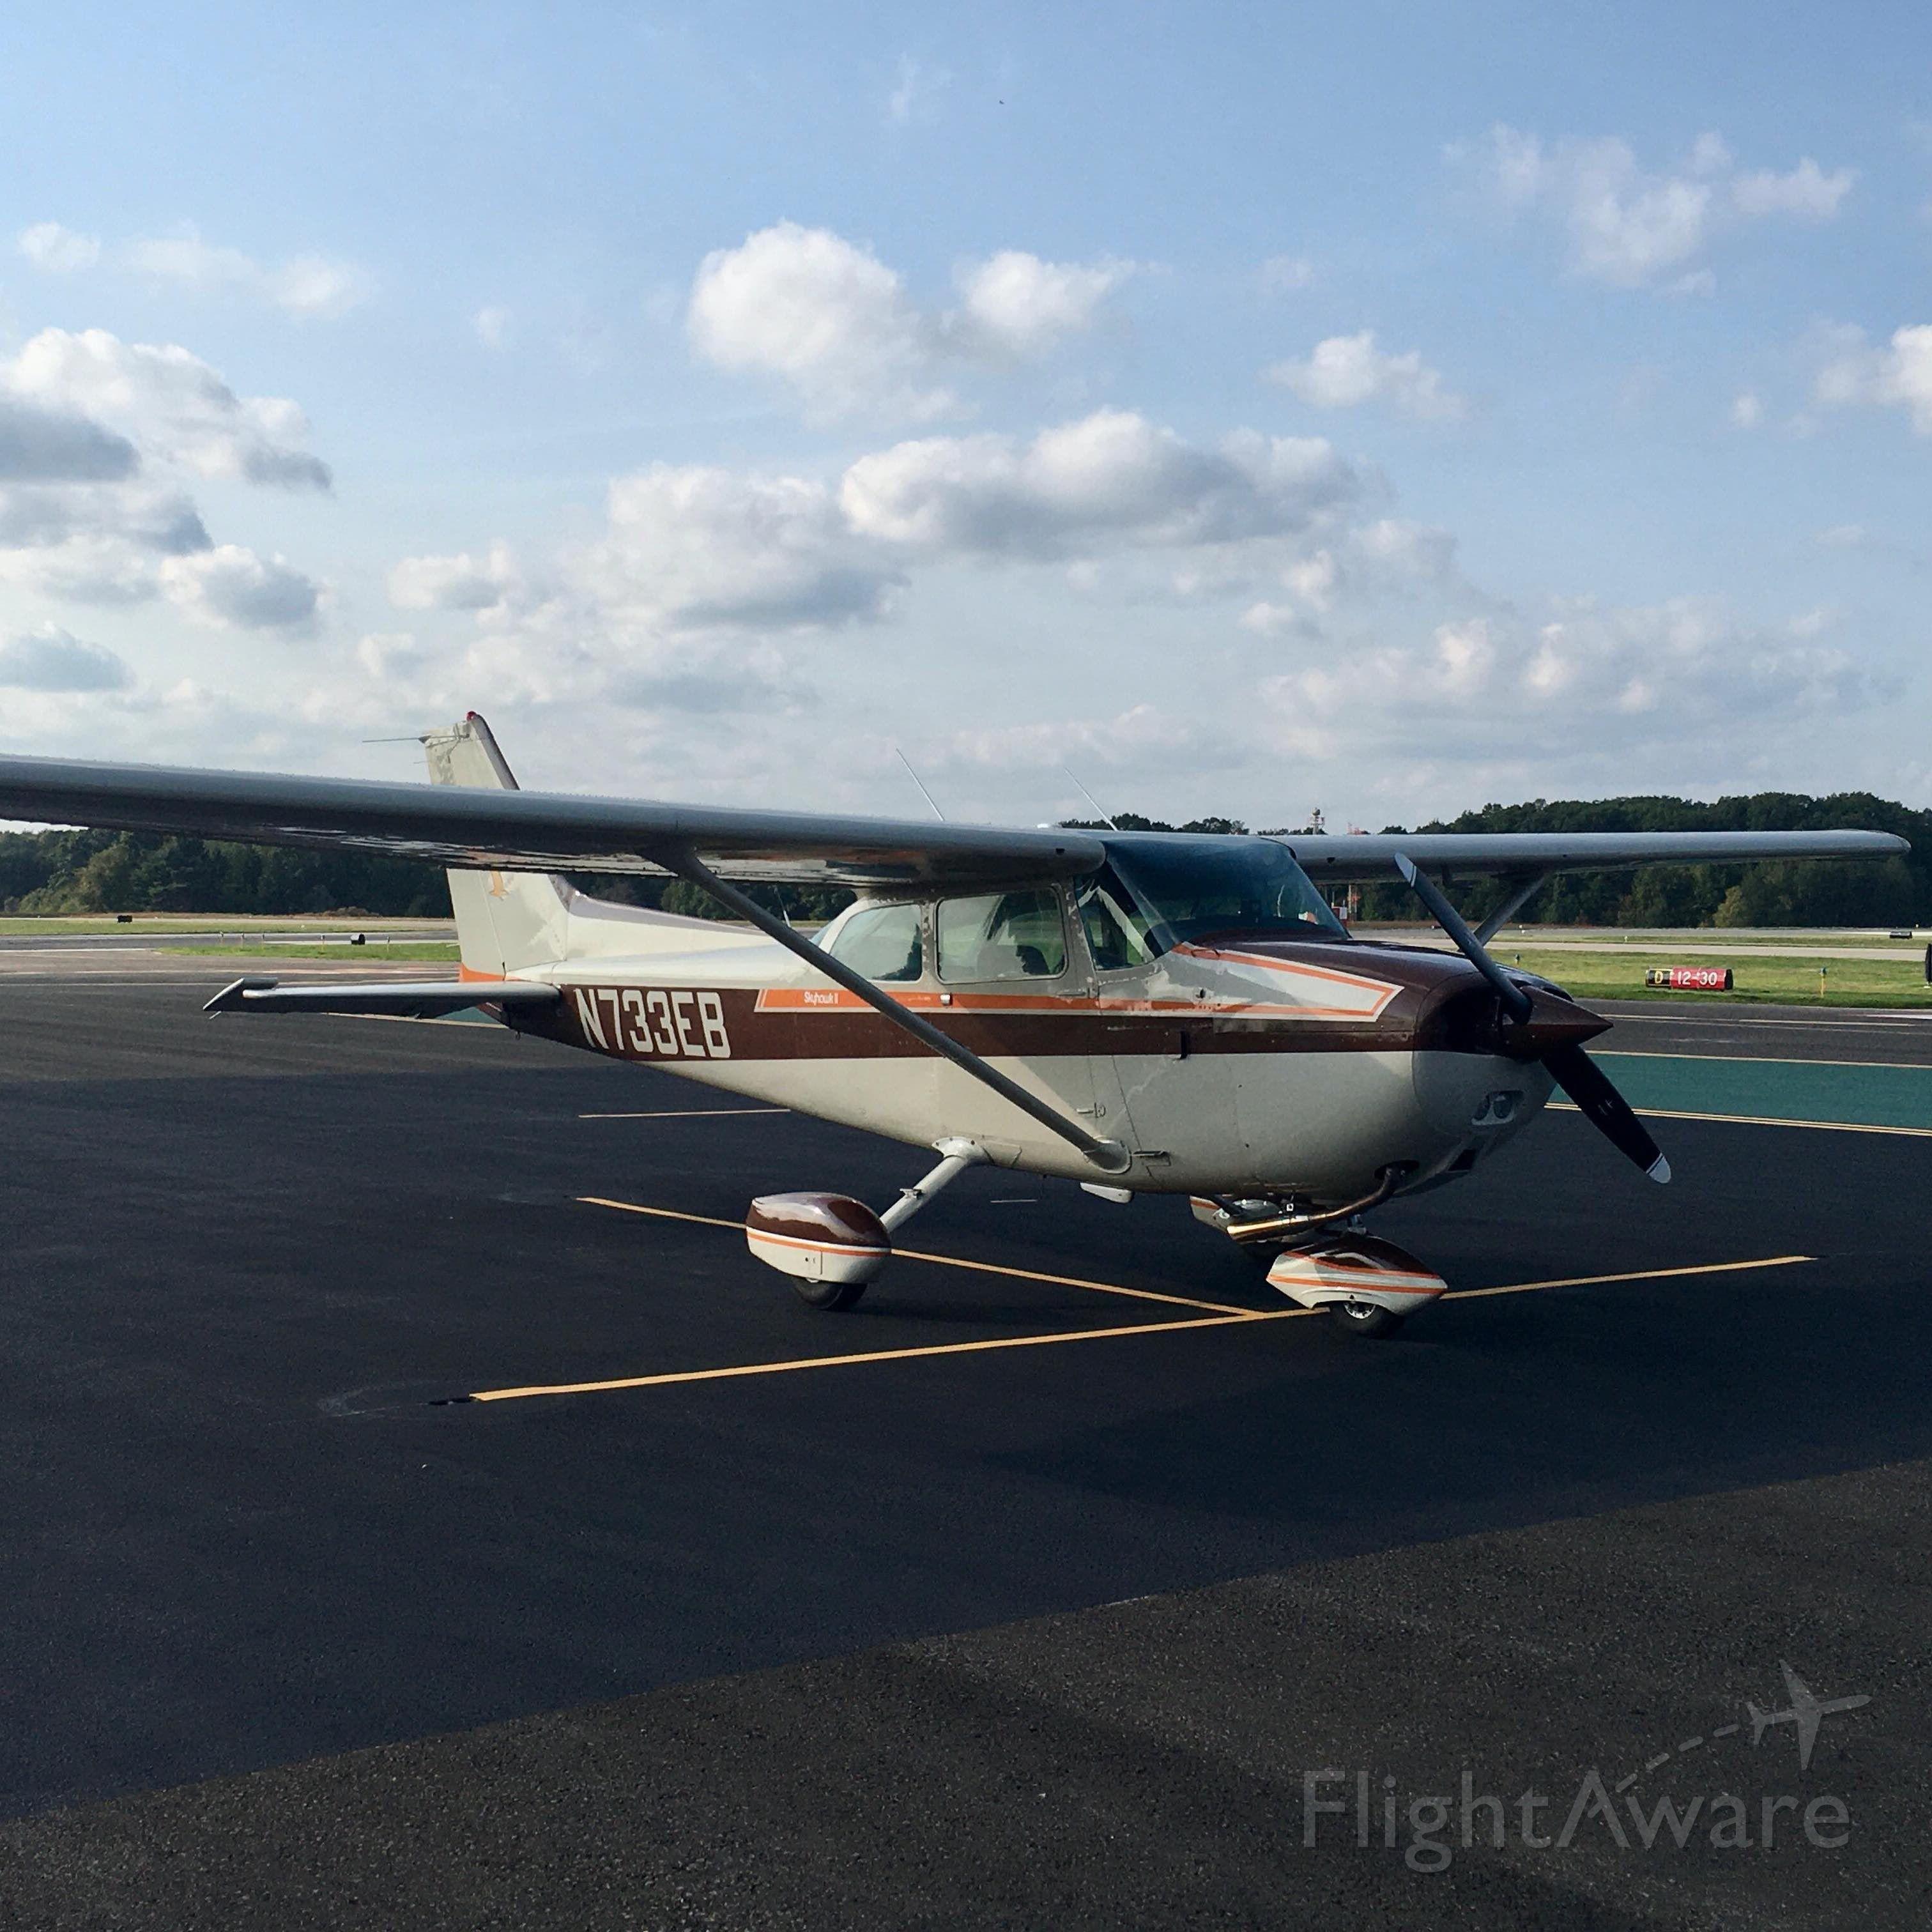 Cessna Skyhawk (N733EB)